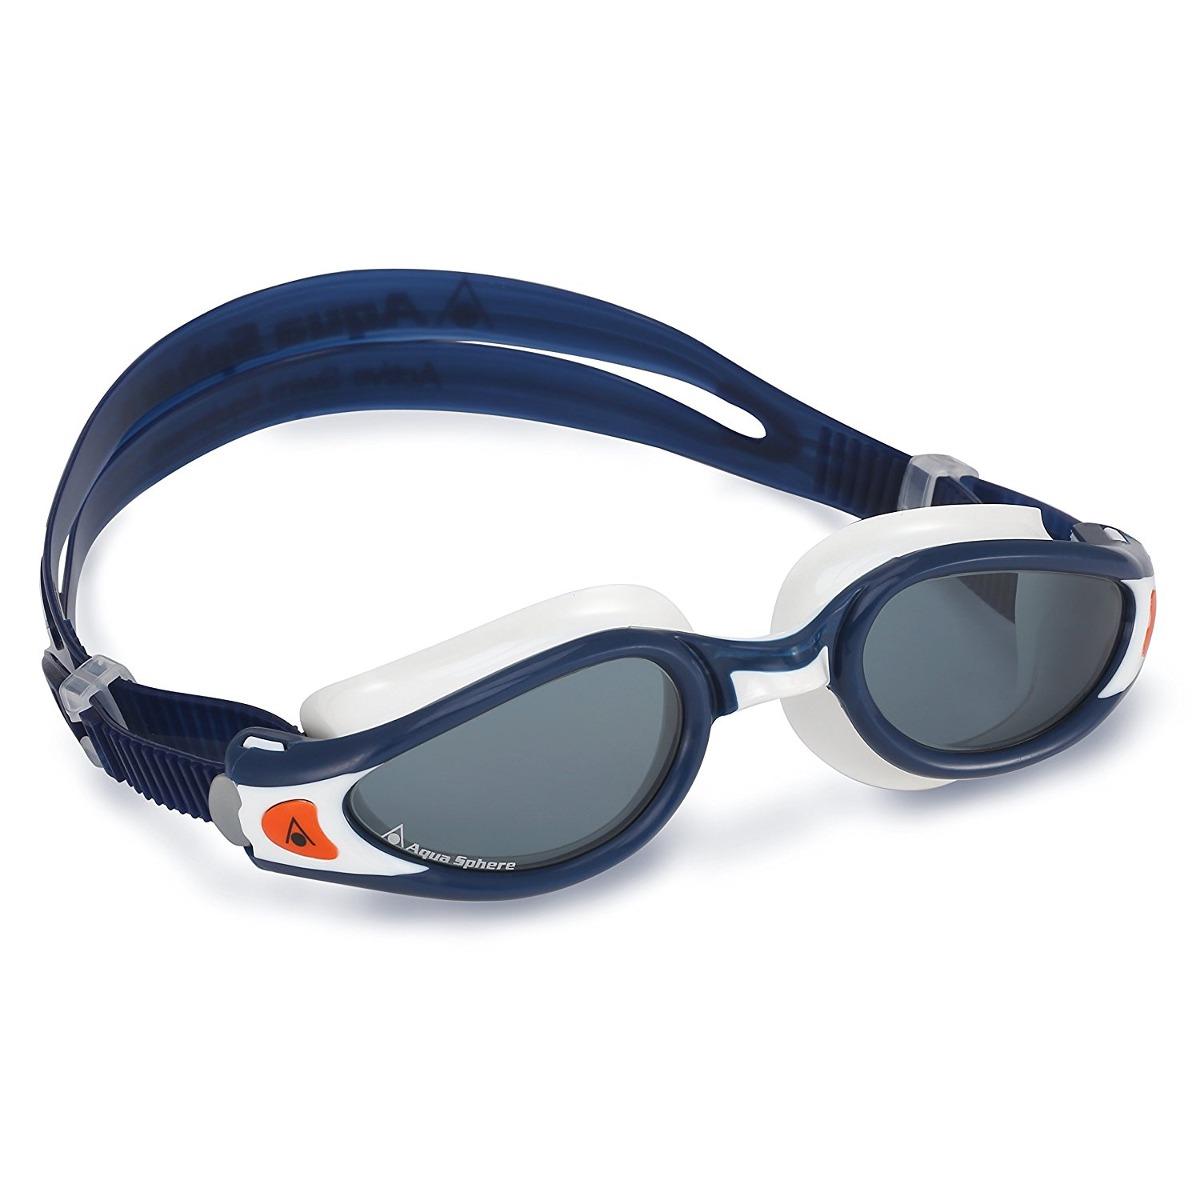 f24a1679c3 Gafas Aqua Sphere Para Natación - $ 232.900 en Mercado Libre